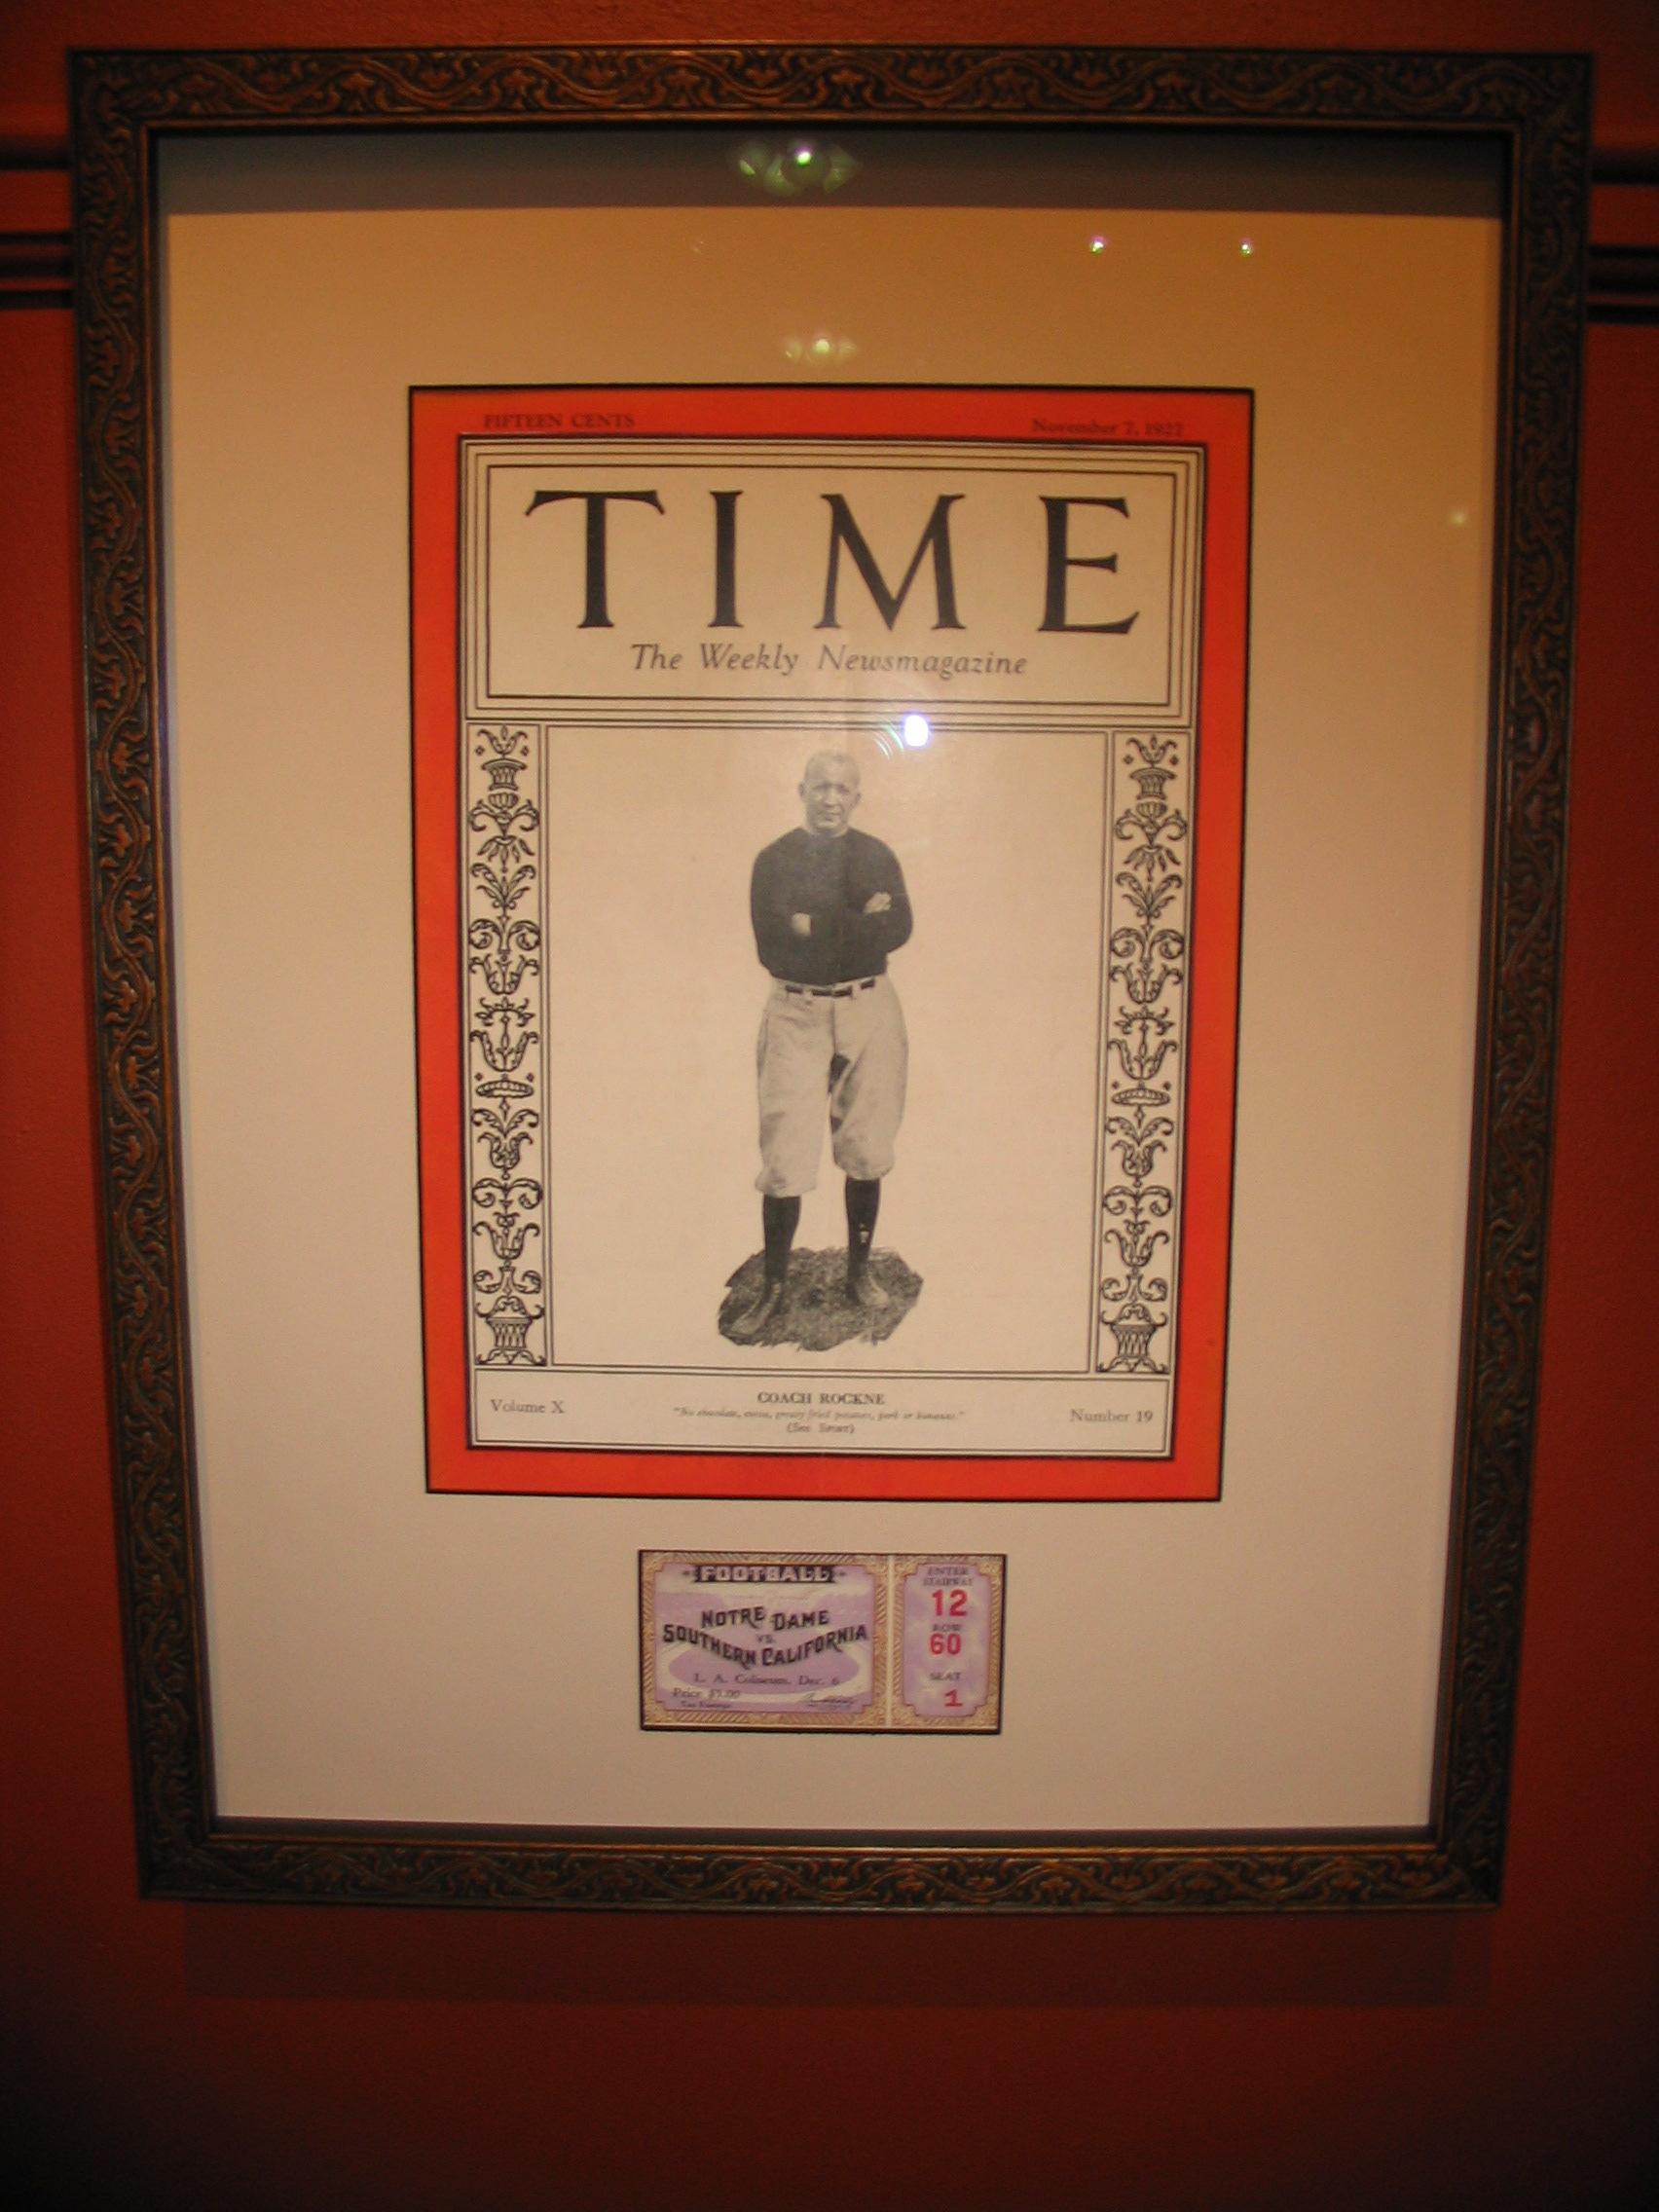 Time Magazine framed by The Framemakers